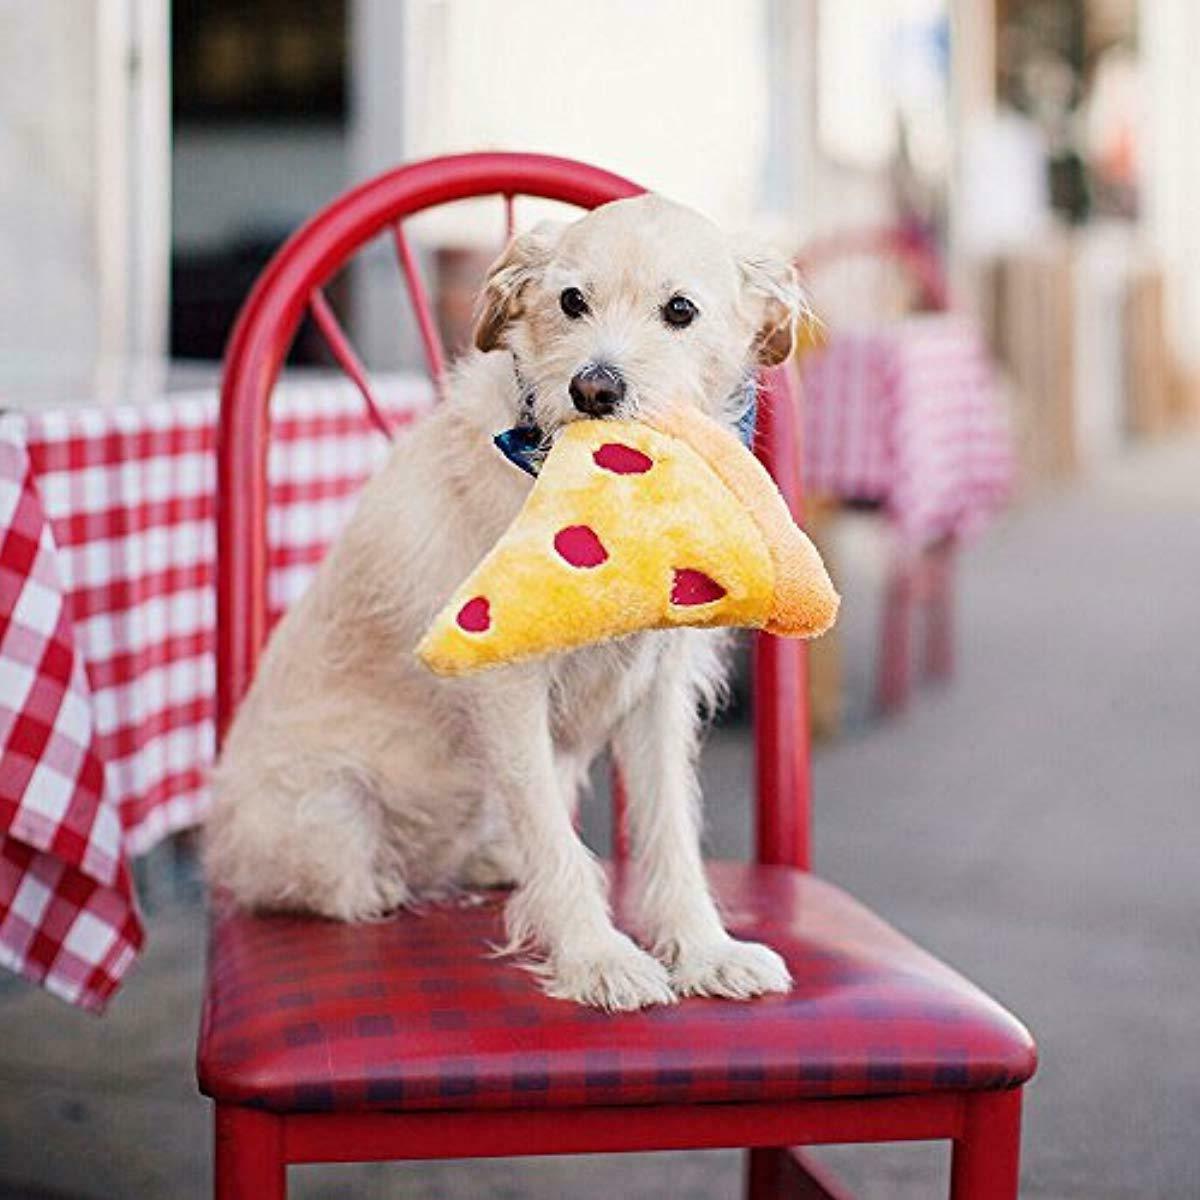 ZippyPaws Squeakie Plush Slice Cute Fun Quirky